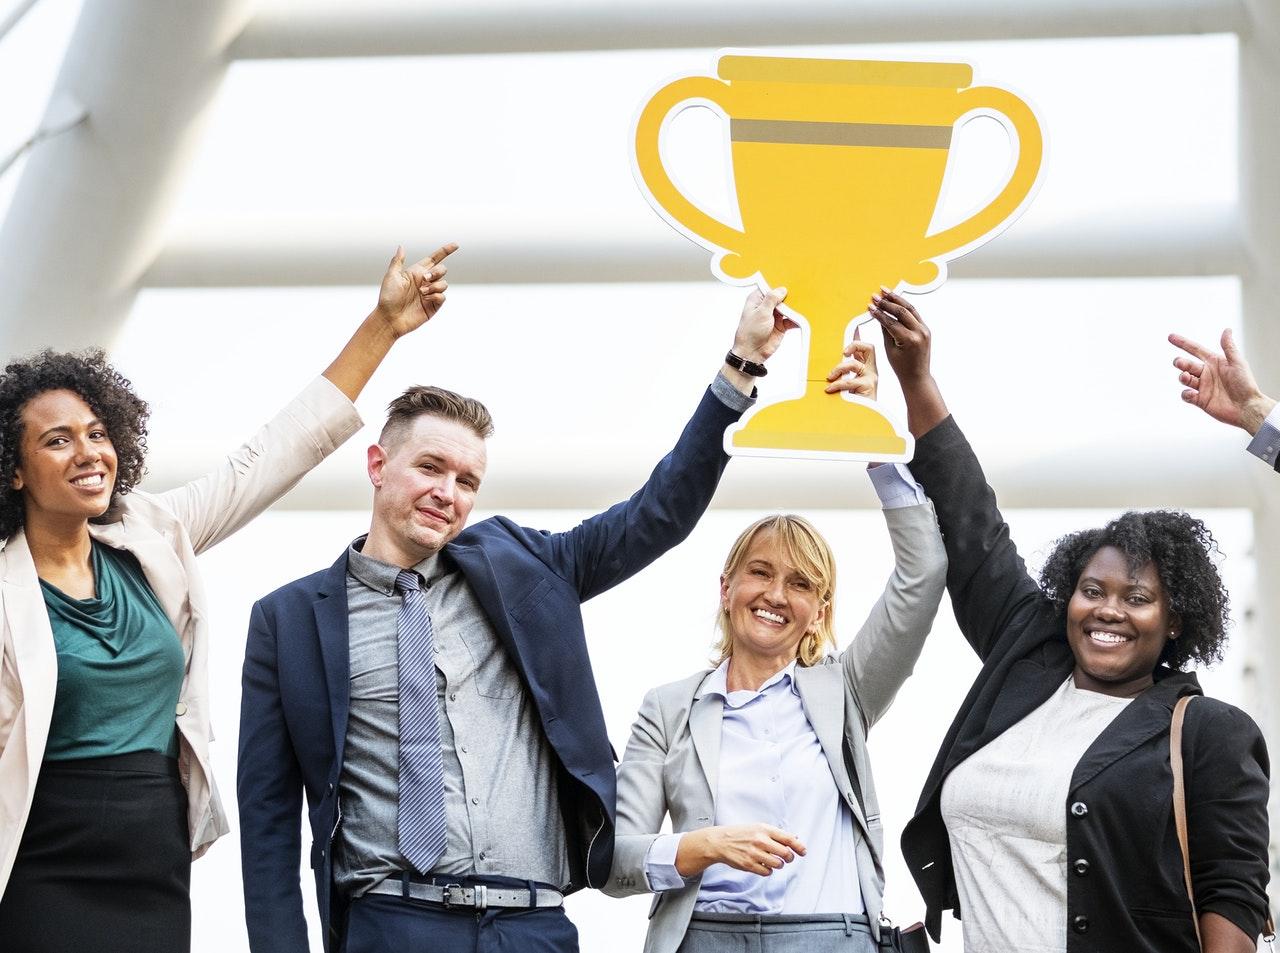 Effective Pre-sales Activities for the Win in B2B Sales